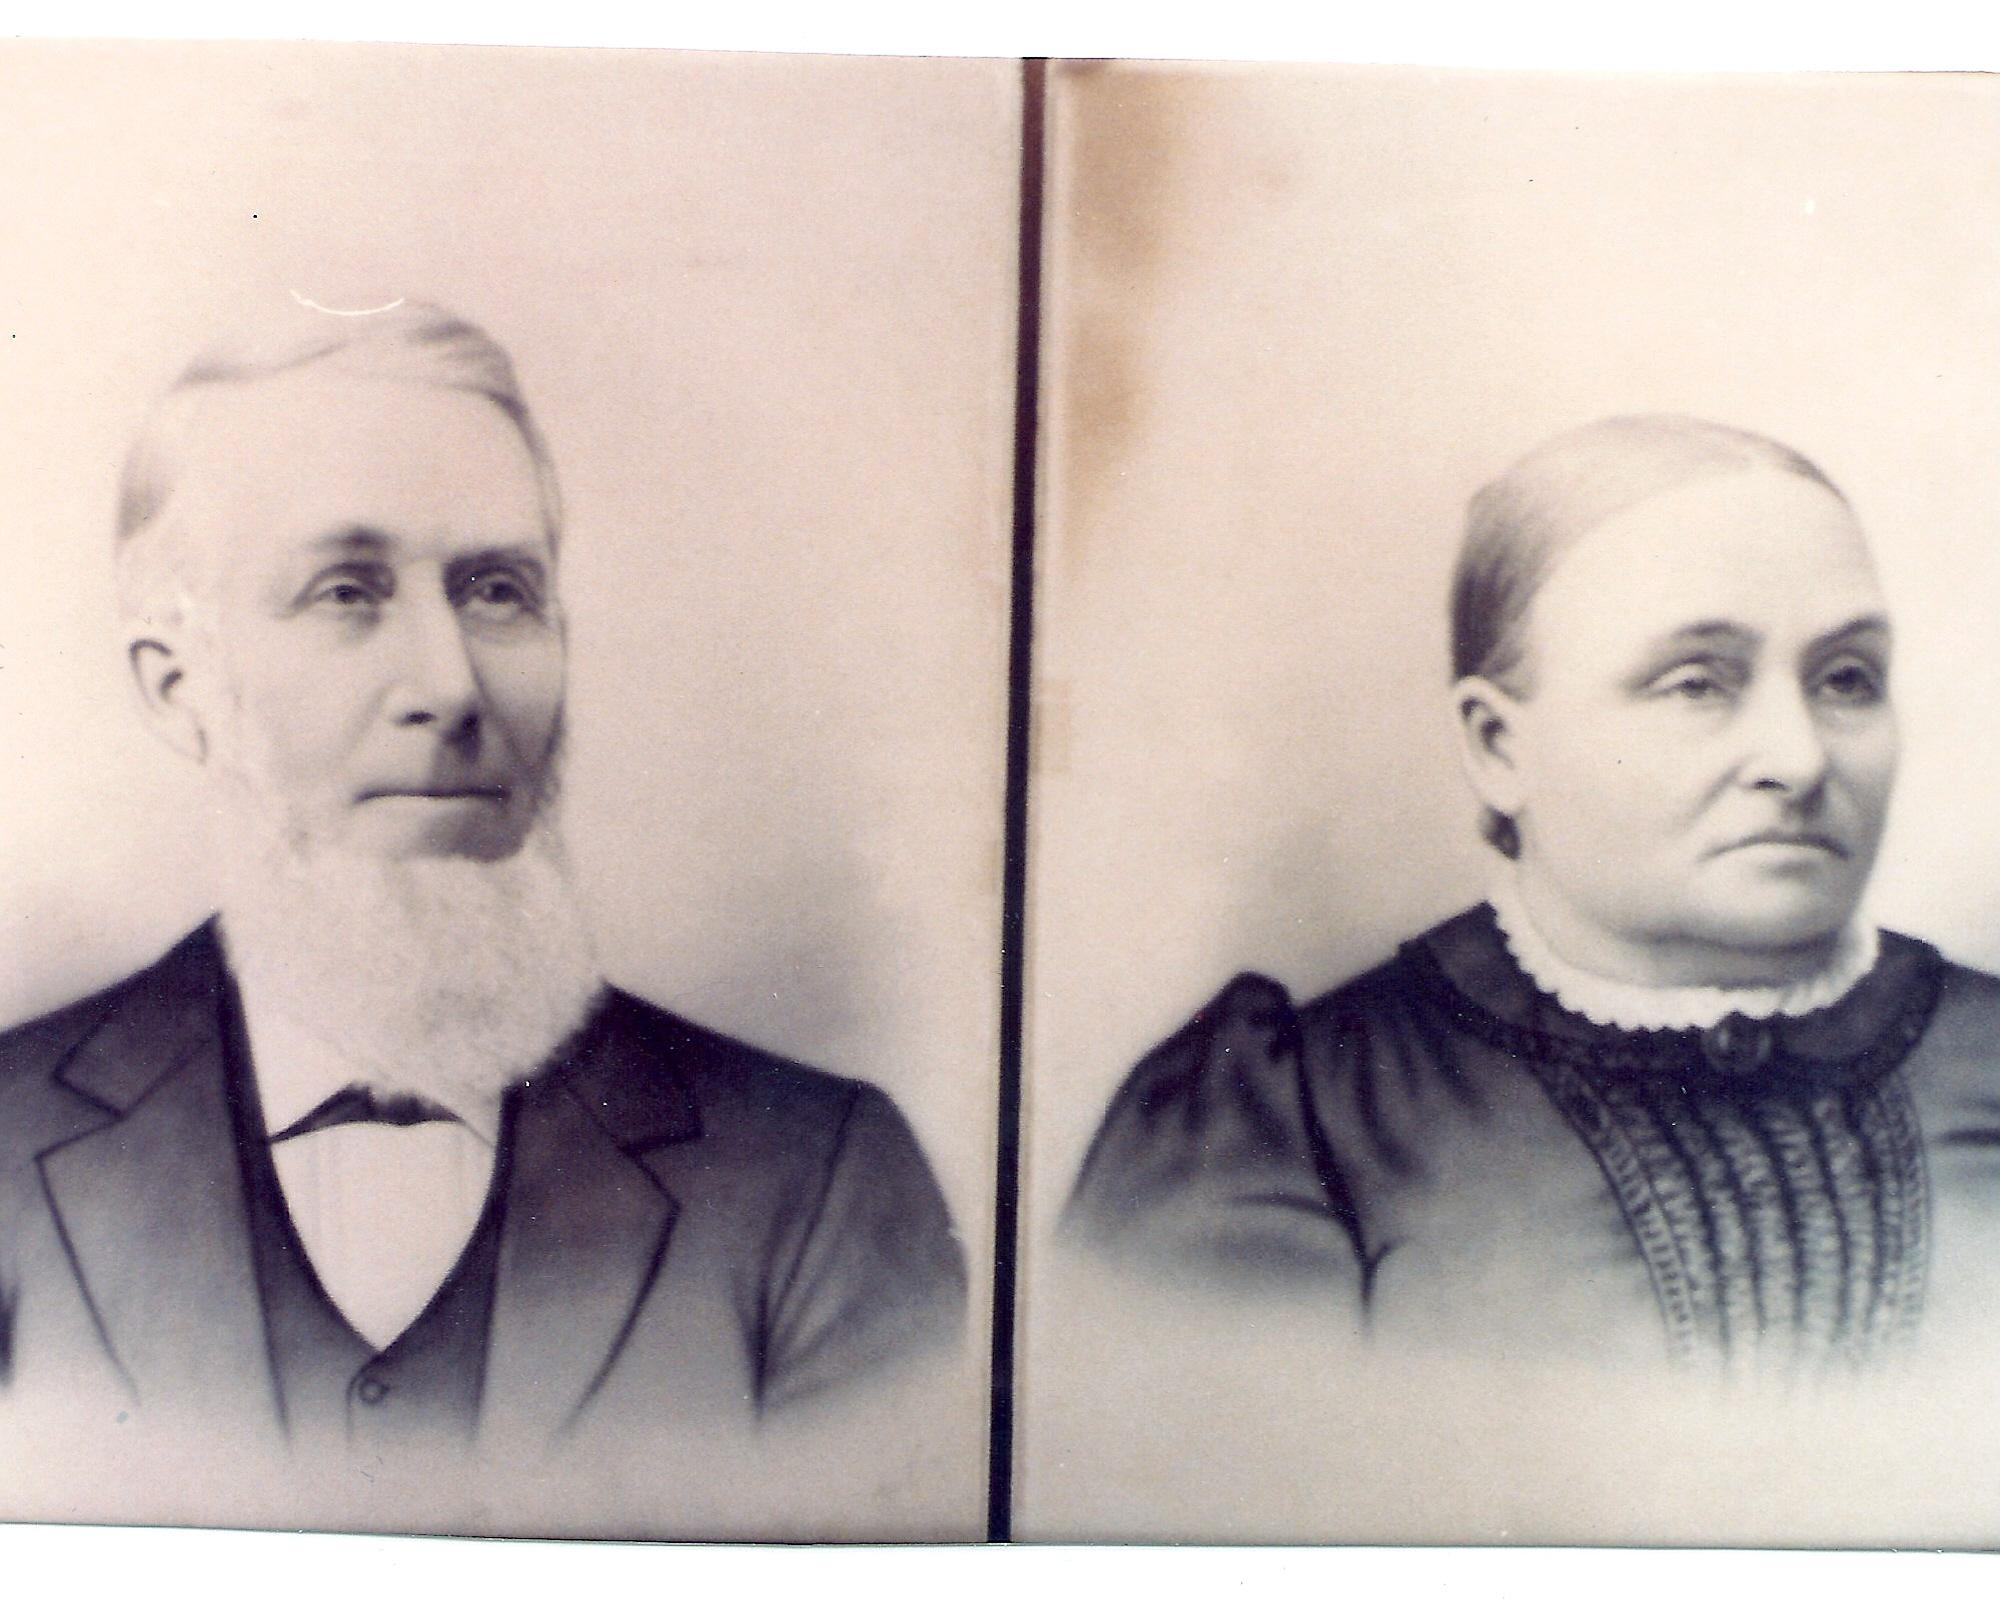 Frederick William Linsley